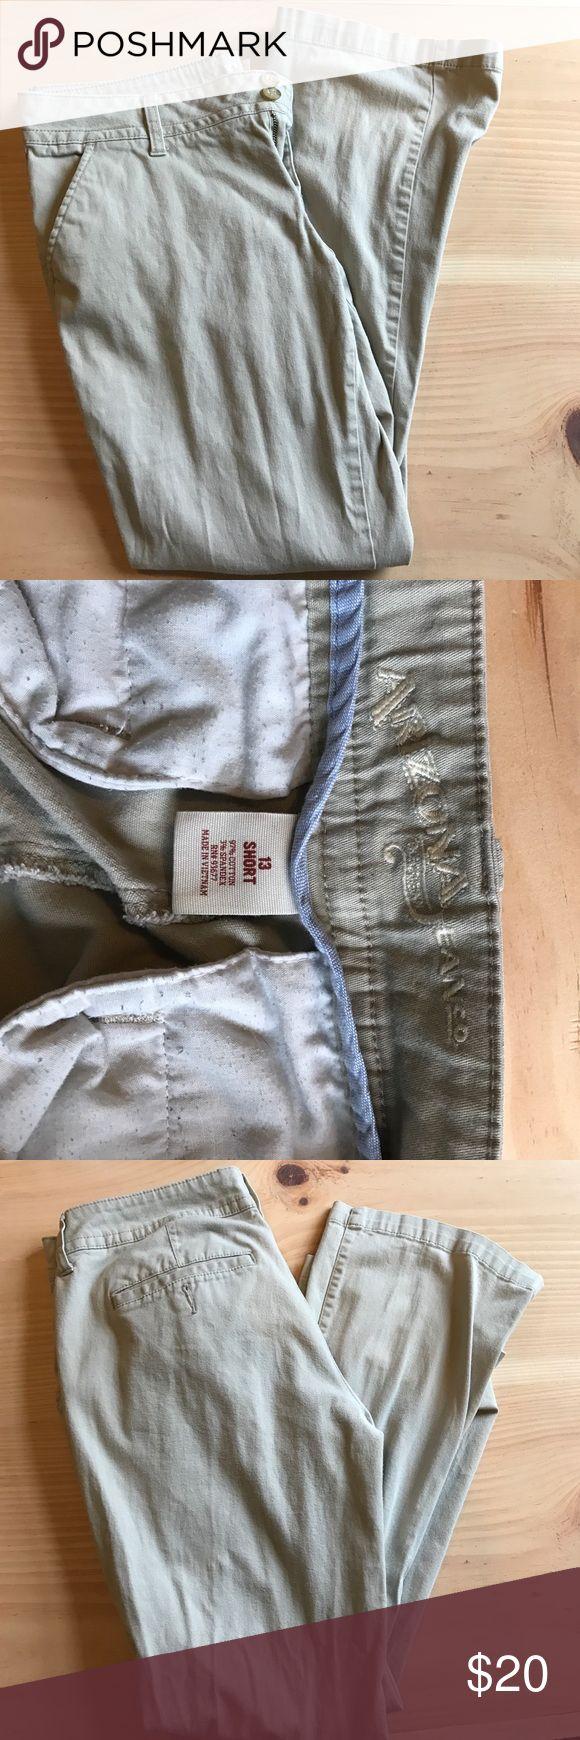 Kaki pants Arizona kaki pants. Worn but in great condition. No stains! Thy are a 13 short. Arizona Jean Company Pants Boot Cut & Flare